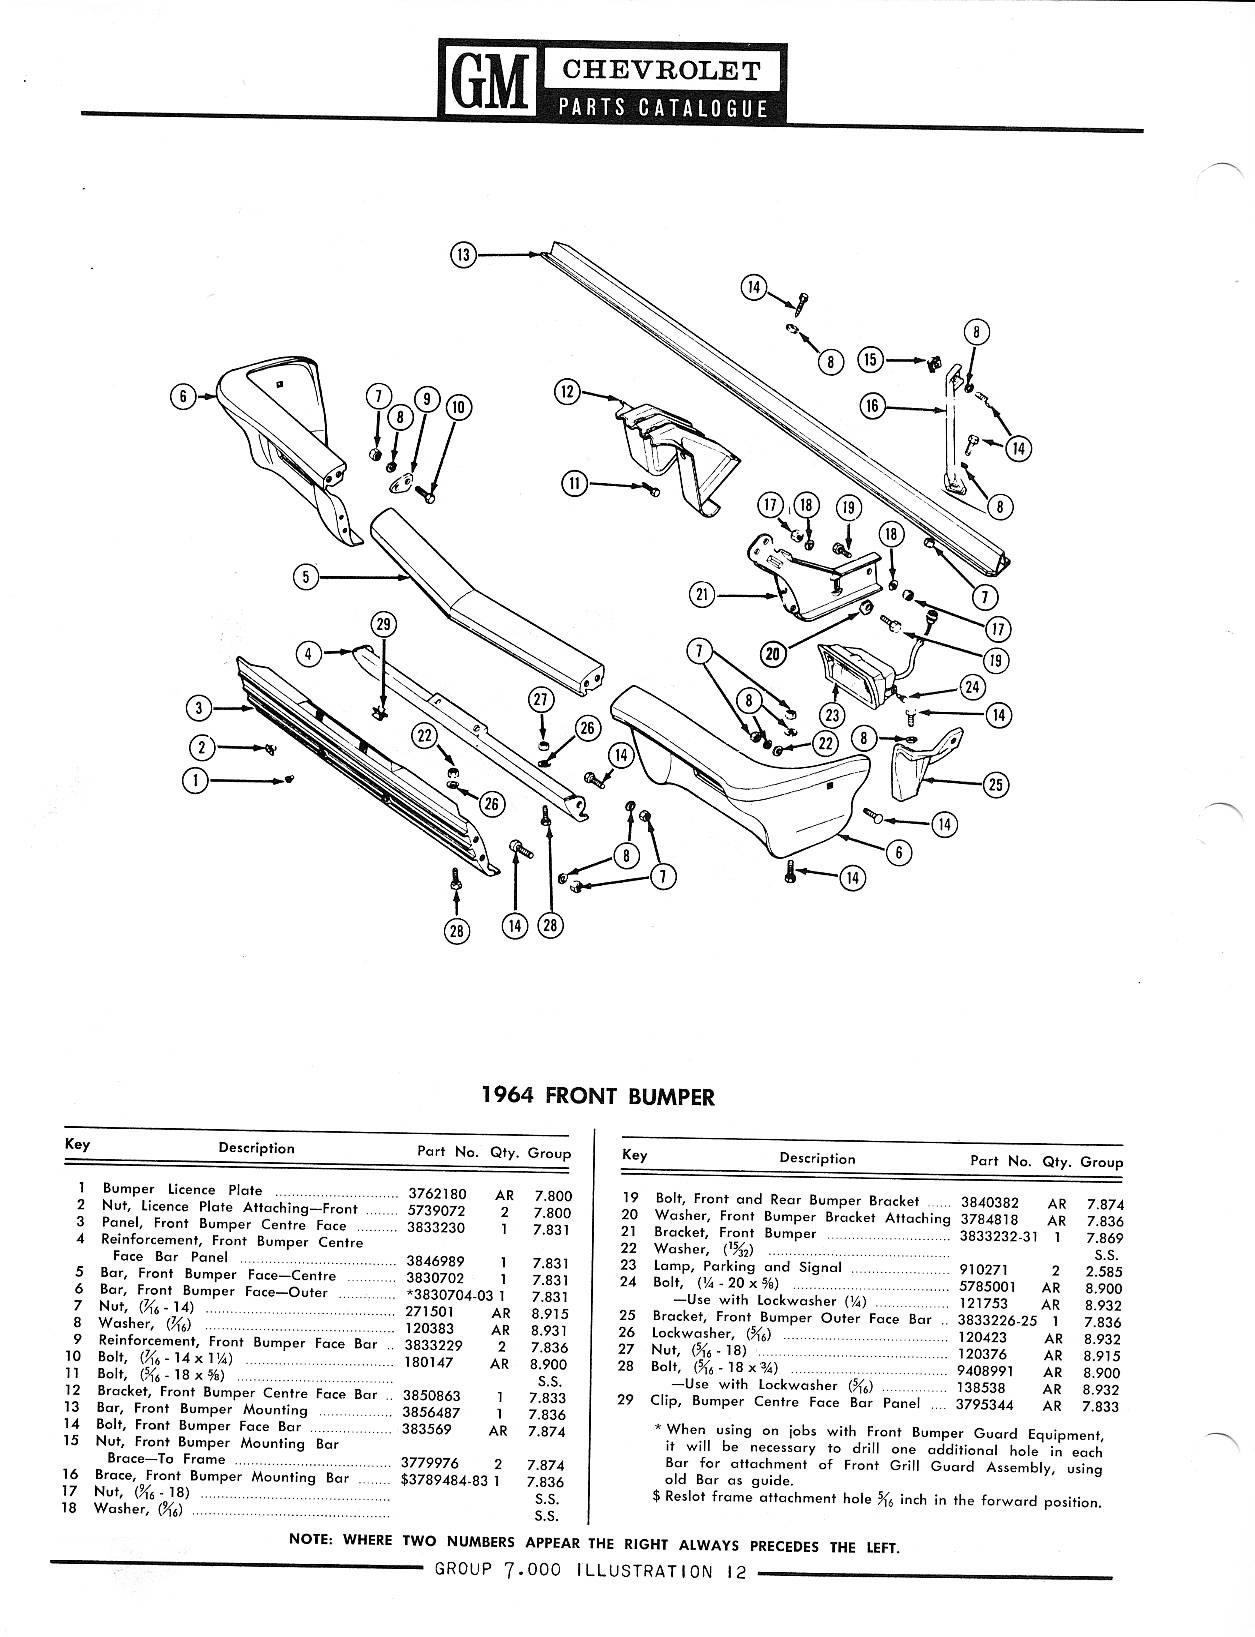 1958-1968 Chevrolet Parts Catalog / Image60.jpg